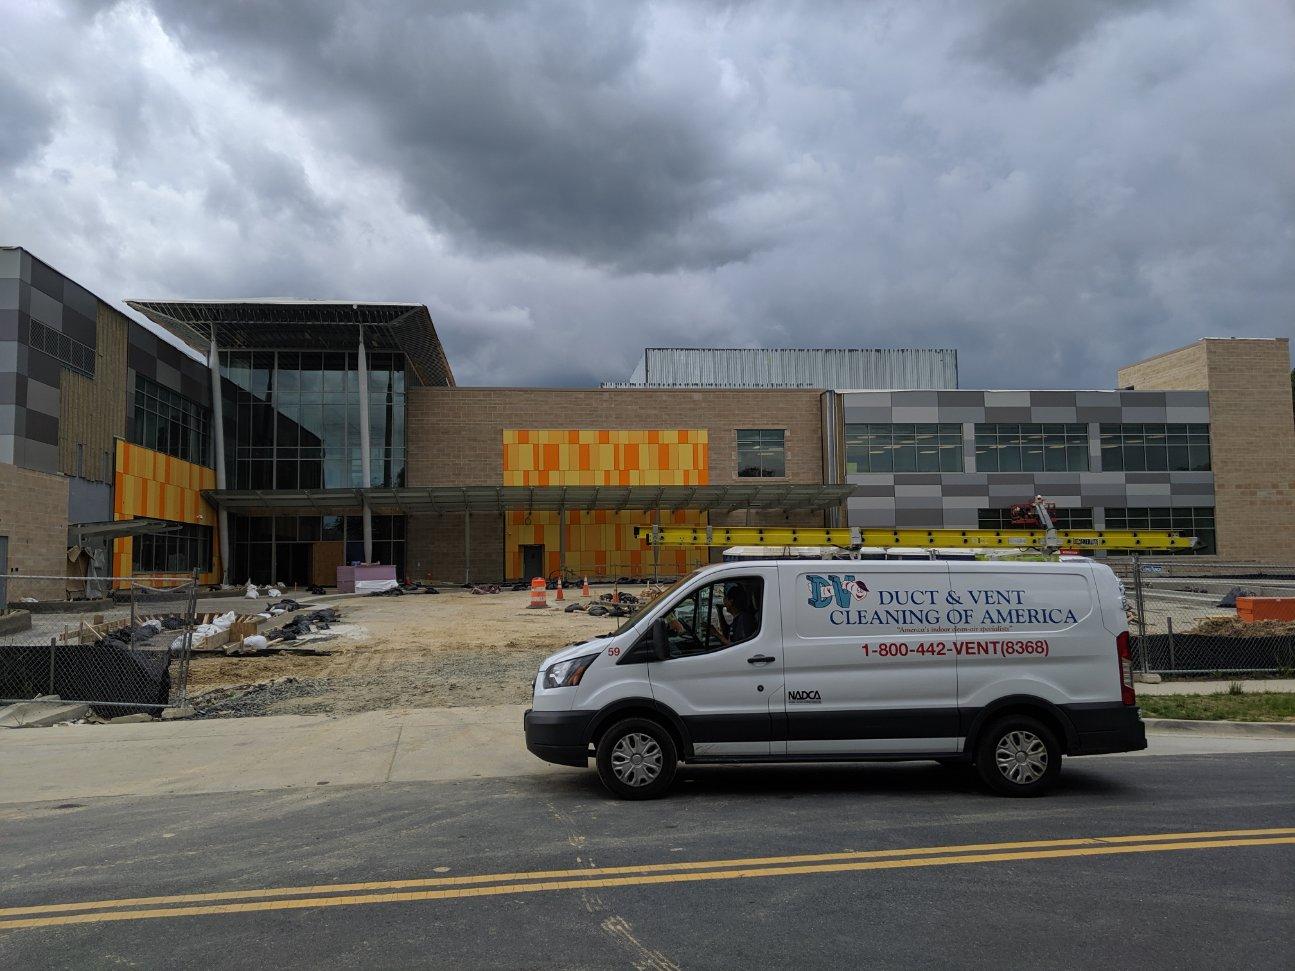 Wheaton Library & Recreation Center Wheaton-Library--Recreation-Center---Duct-Cleaning.jpg